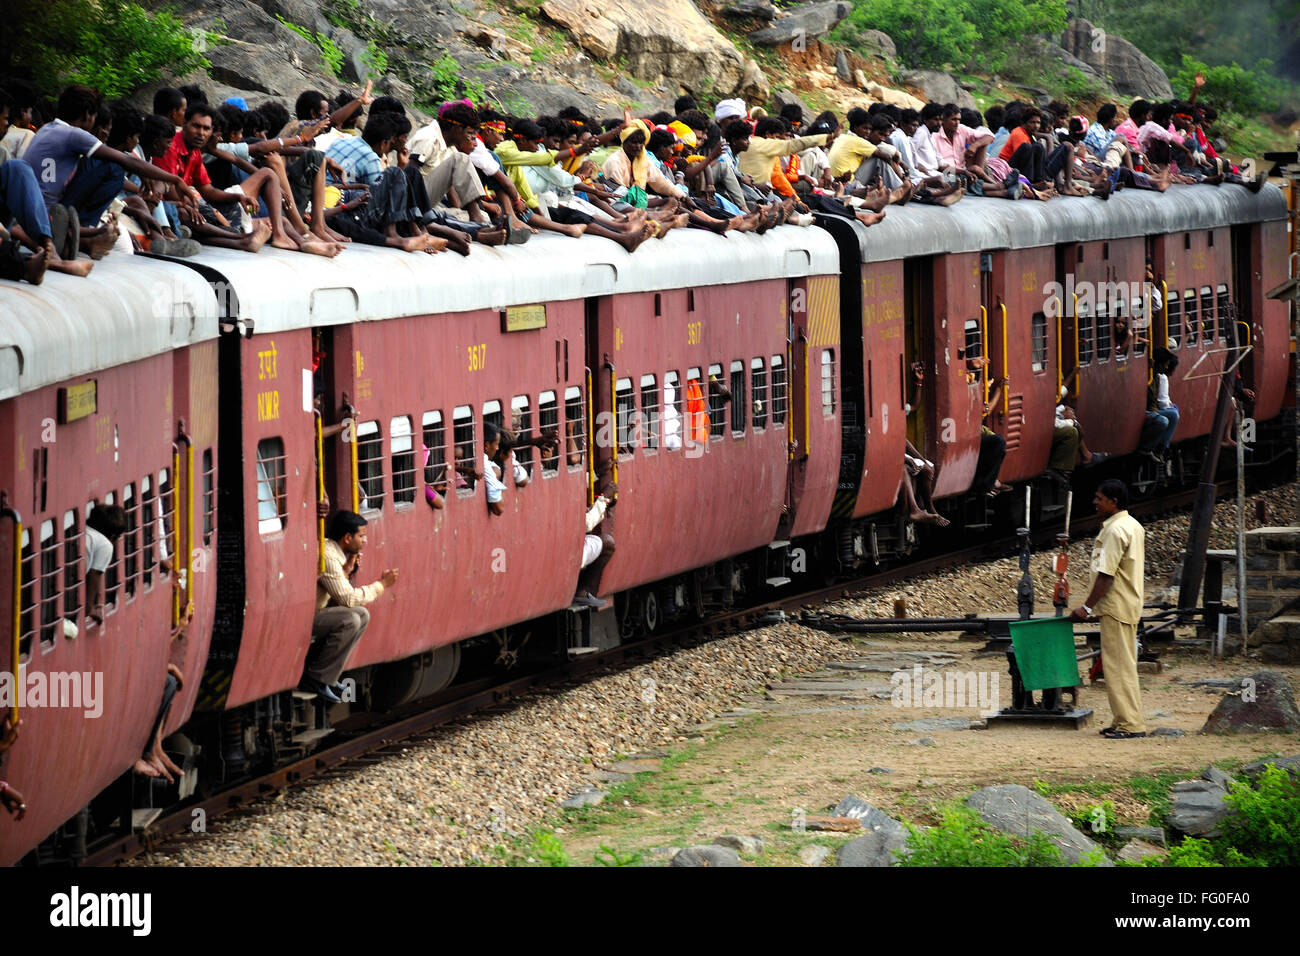 Commuters sitting on roof of train ; Kamali Ghat ; Rajasthan ; India & Commuters sitting on roof of train ; Kamali Ghat ; Rajasthan ... memphite.com